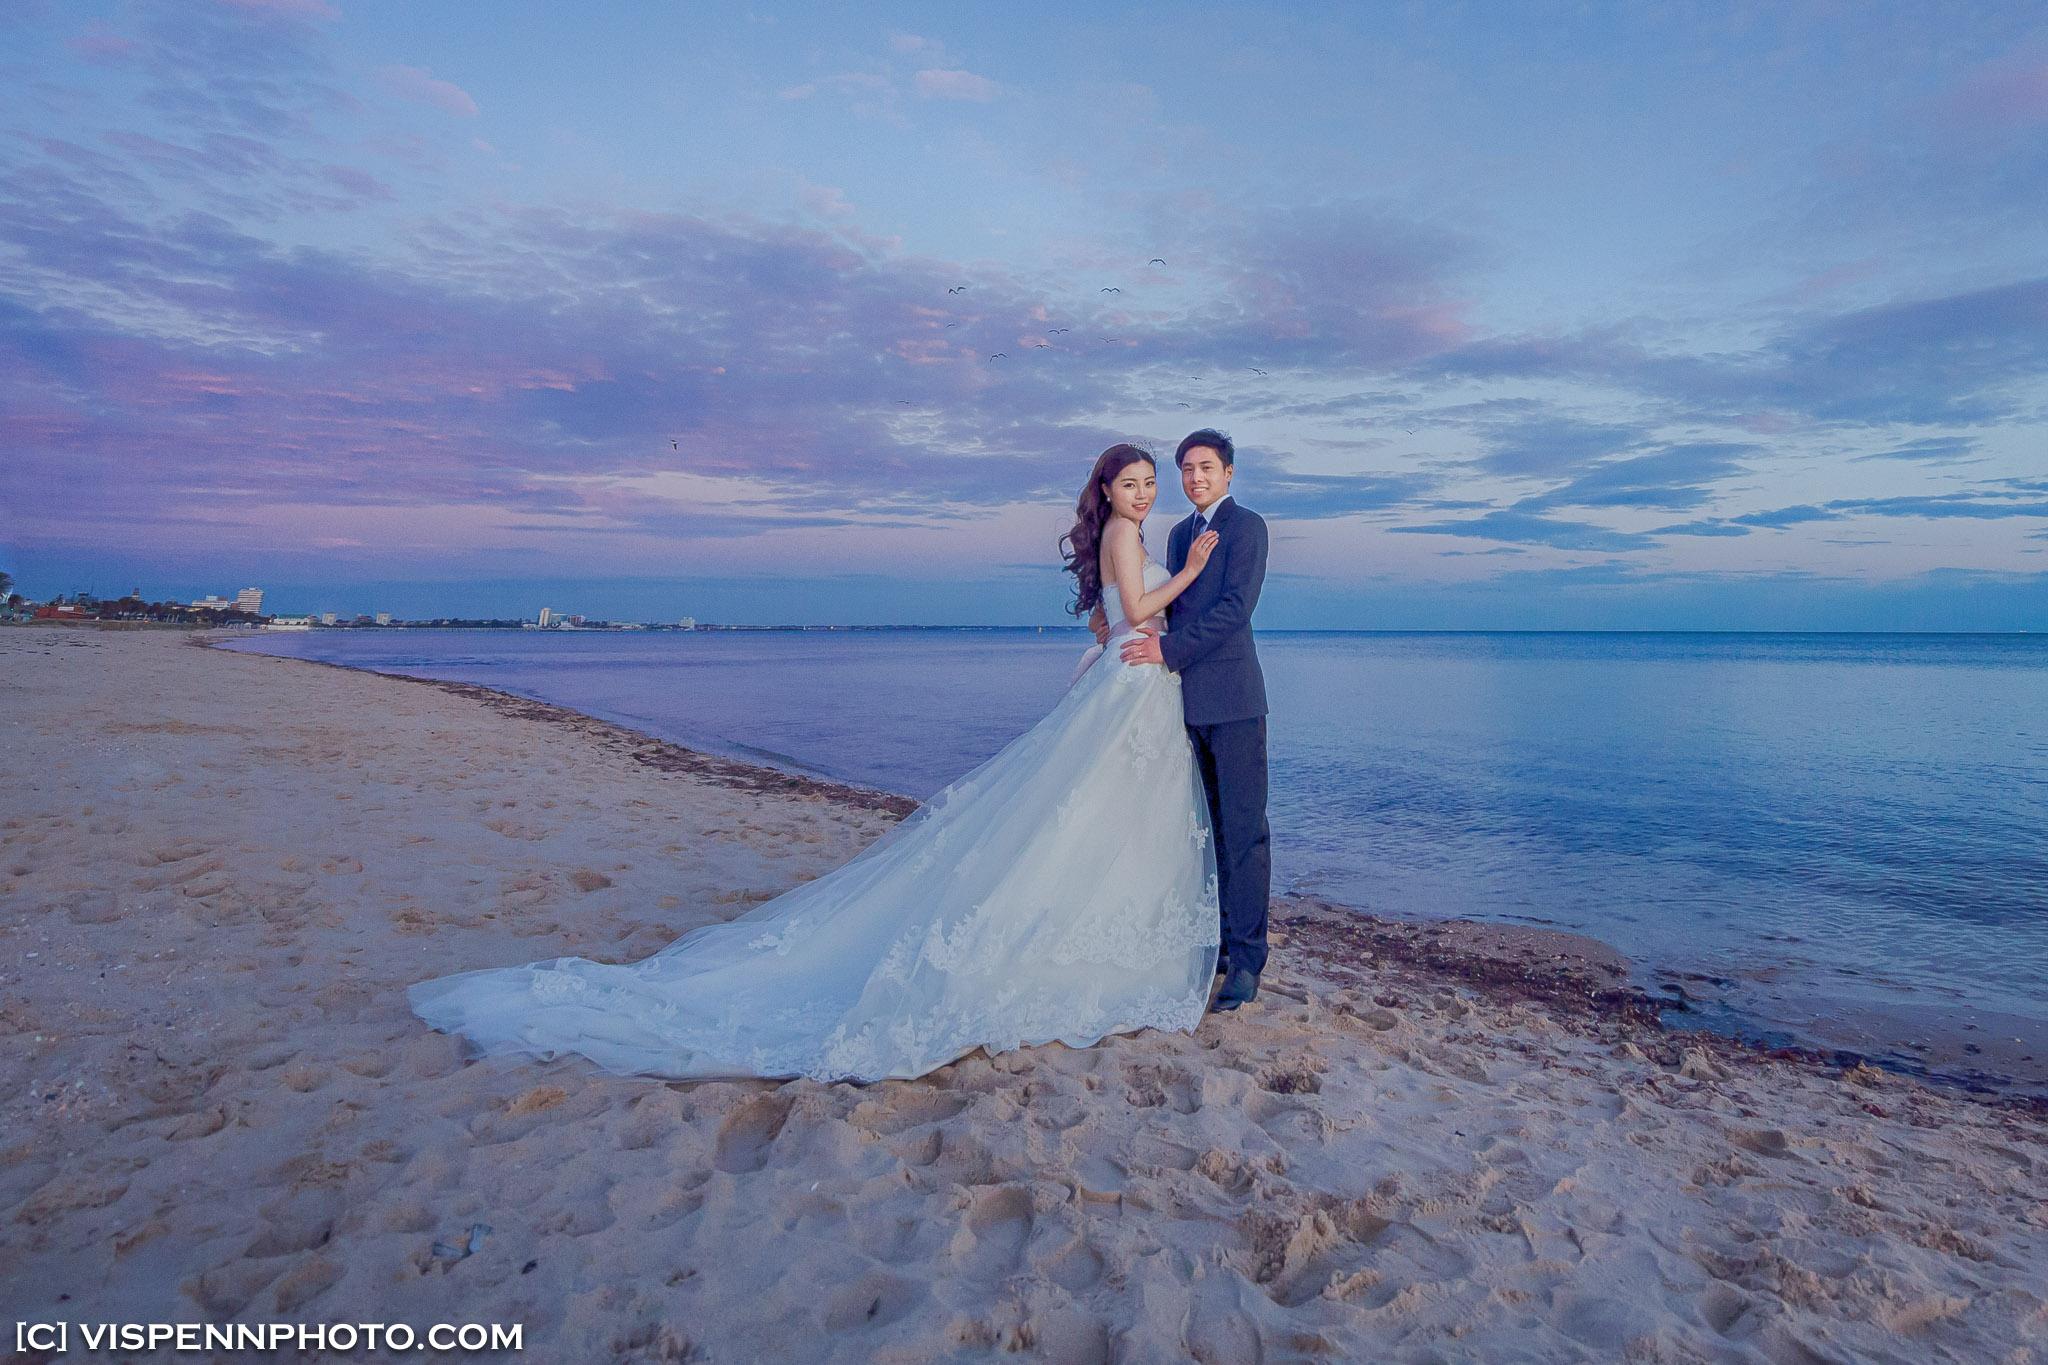 PRE WEDDING Photography Melbourne VISPENN 墨尔本 婚纱照 结婚照 婚纱摄影 VISPENN JackySerena 2730副本